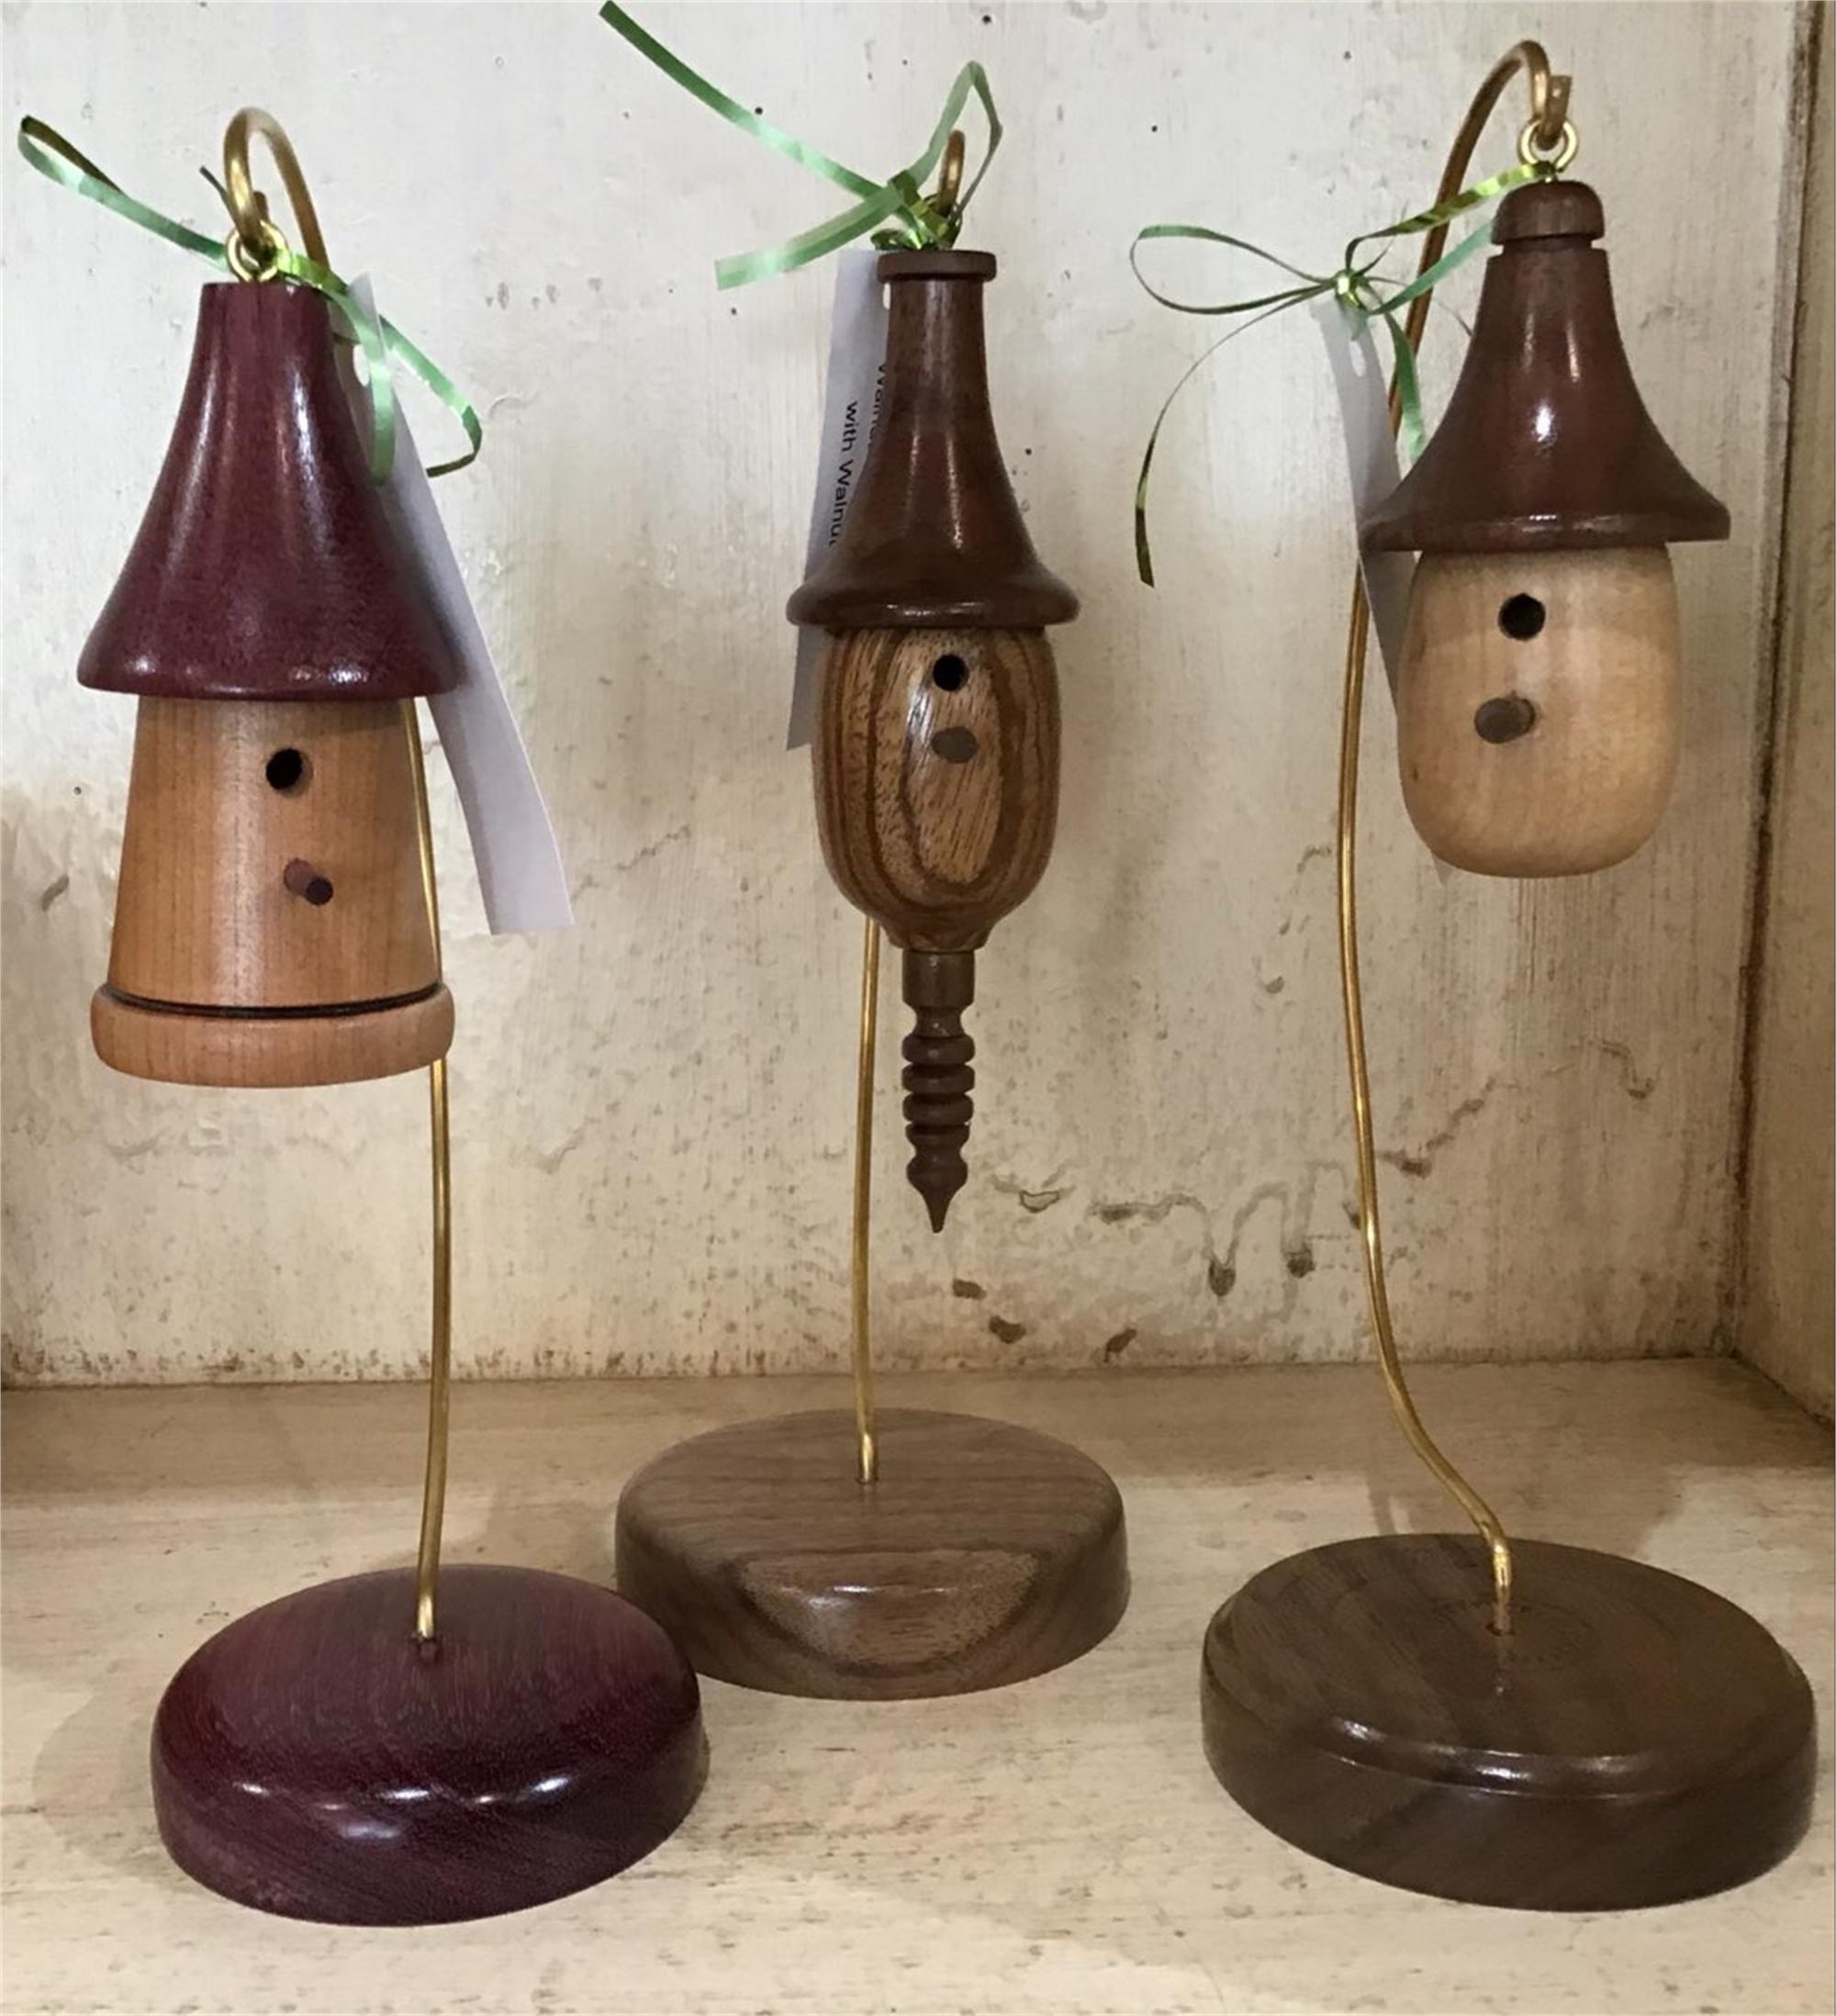 Walnut & Zebrawood Birdhouse by Lynn Chastain